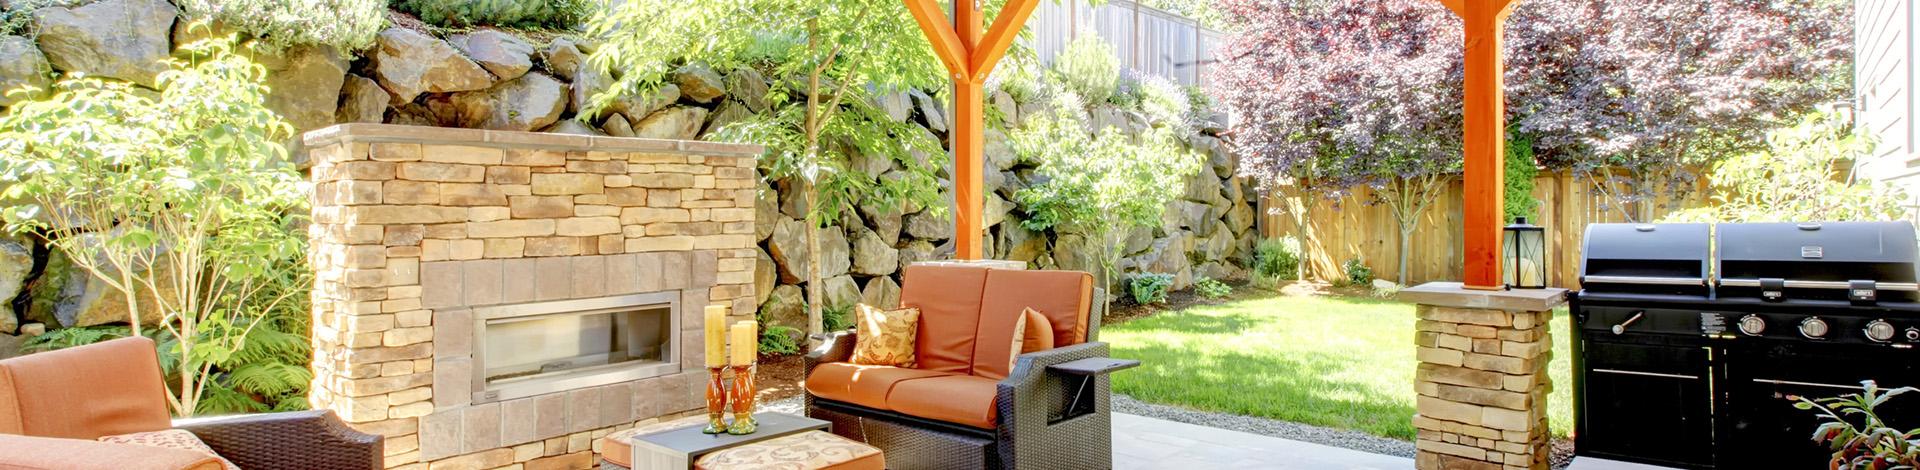 martin krickl gartengestaltung markgr ningen gartenbau und landschaftsbau ludwigsburg. Black Bedroom Furniture Sets. Home Design Ideas